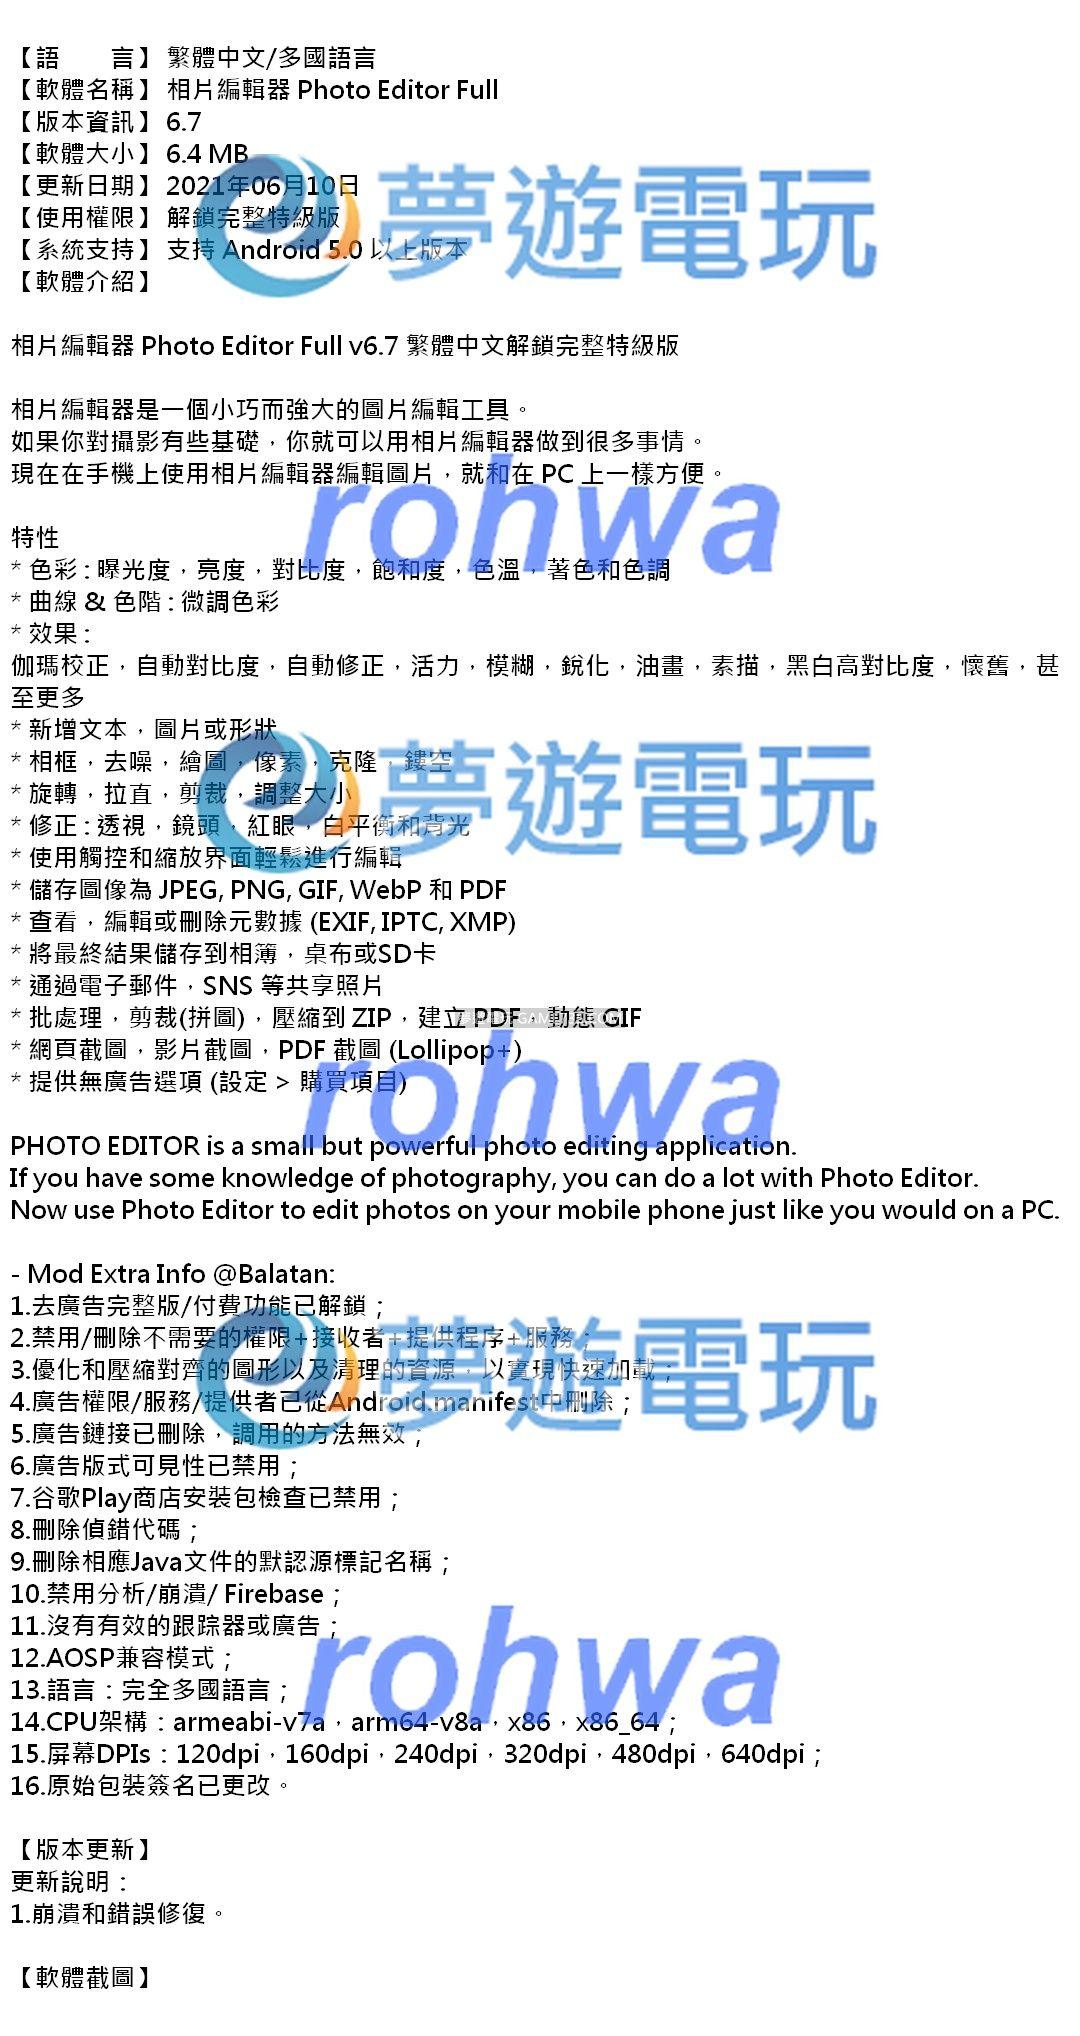 PhotoEditor_Full_6.7_.jpg